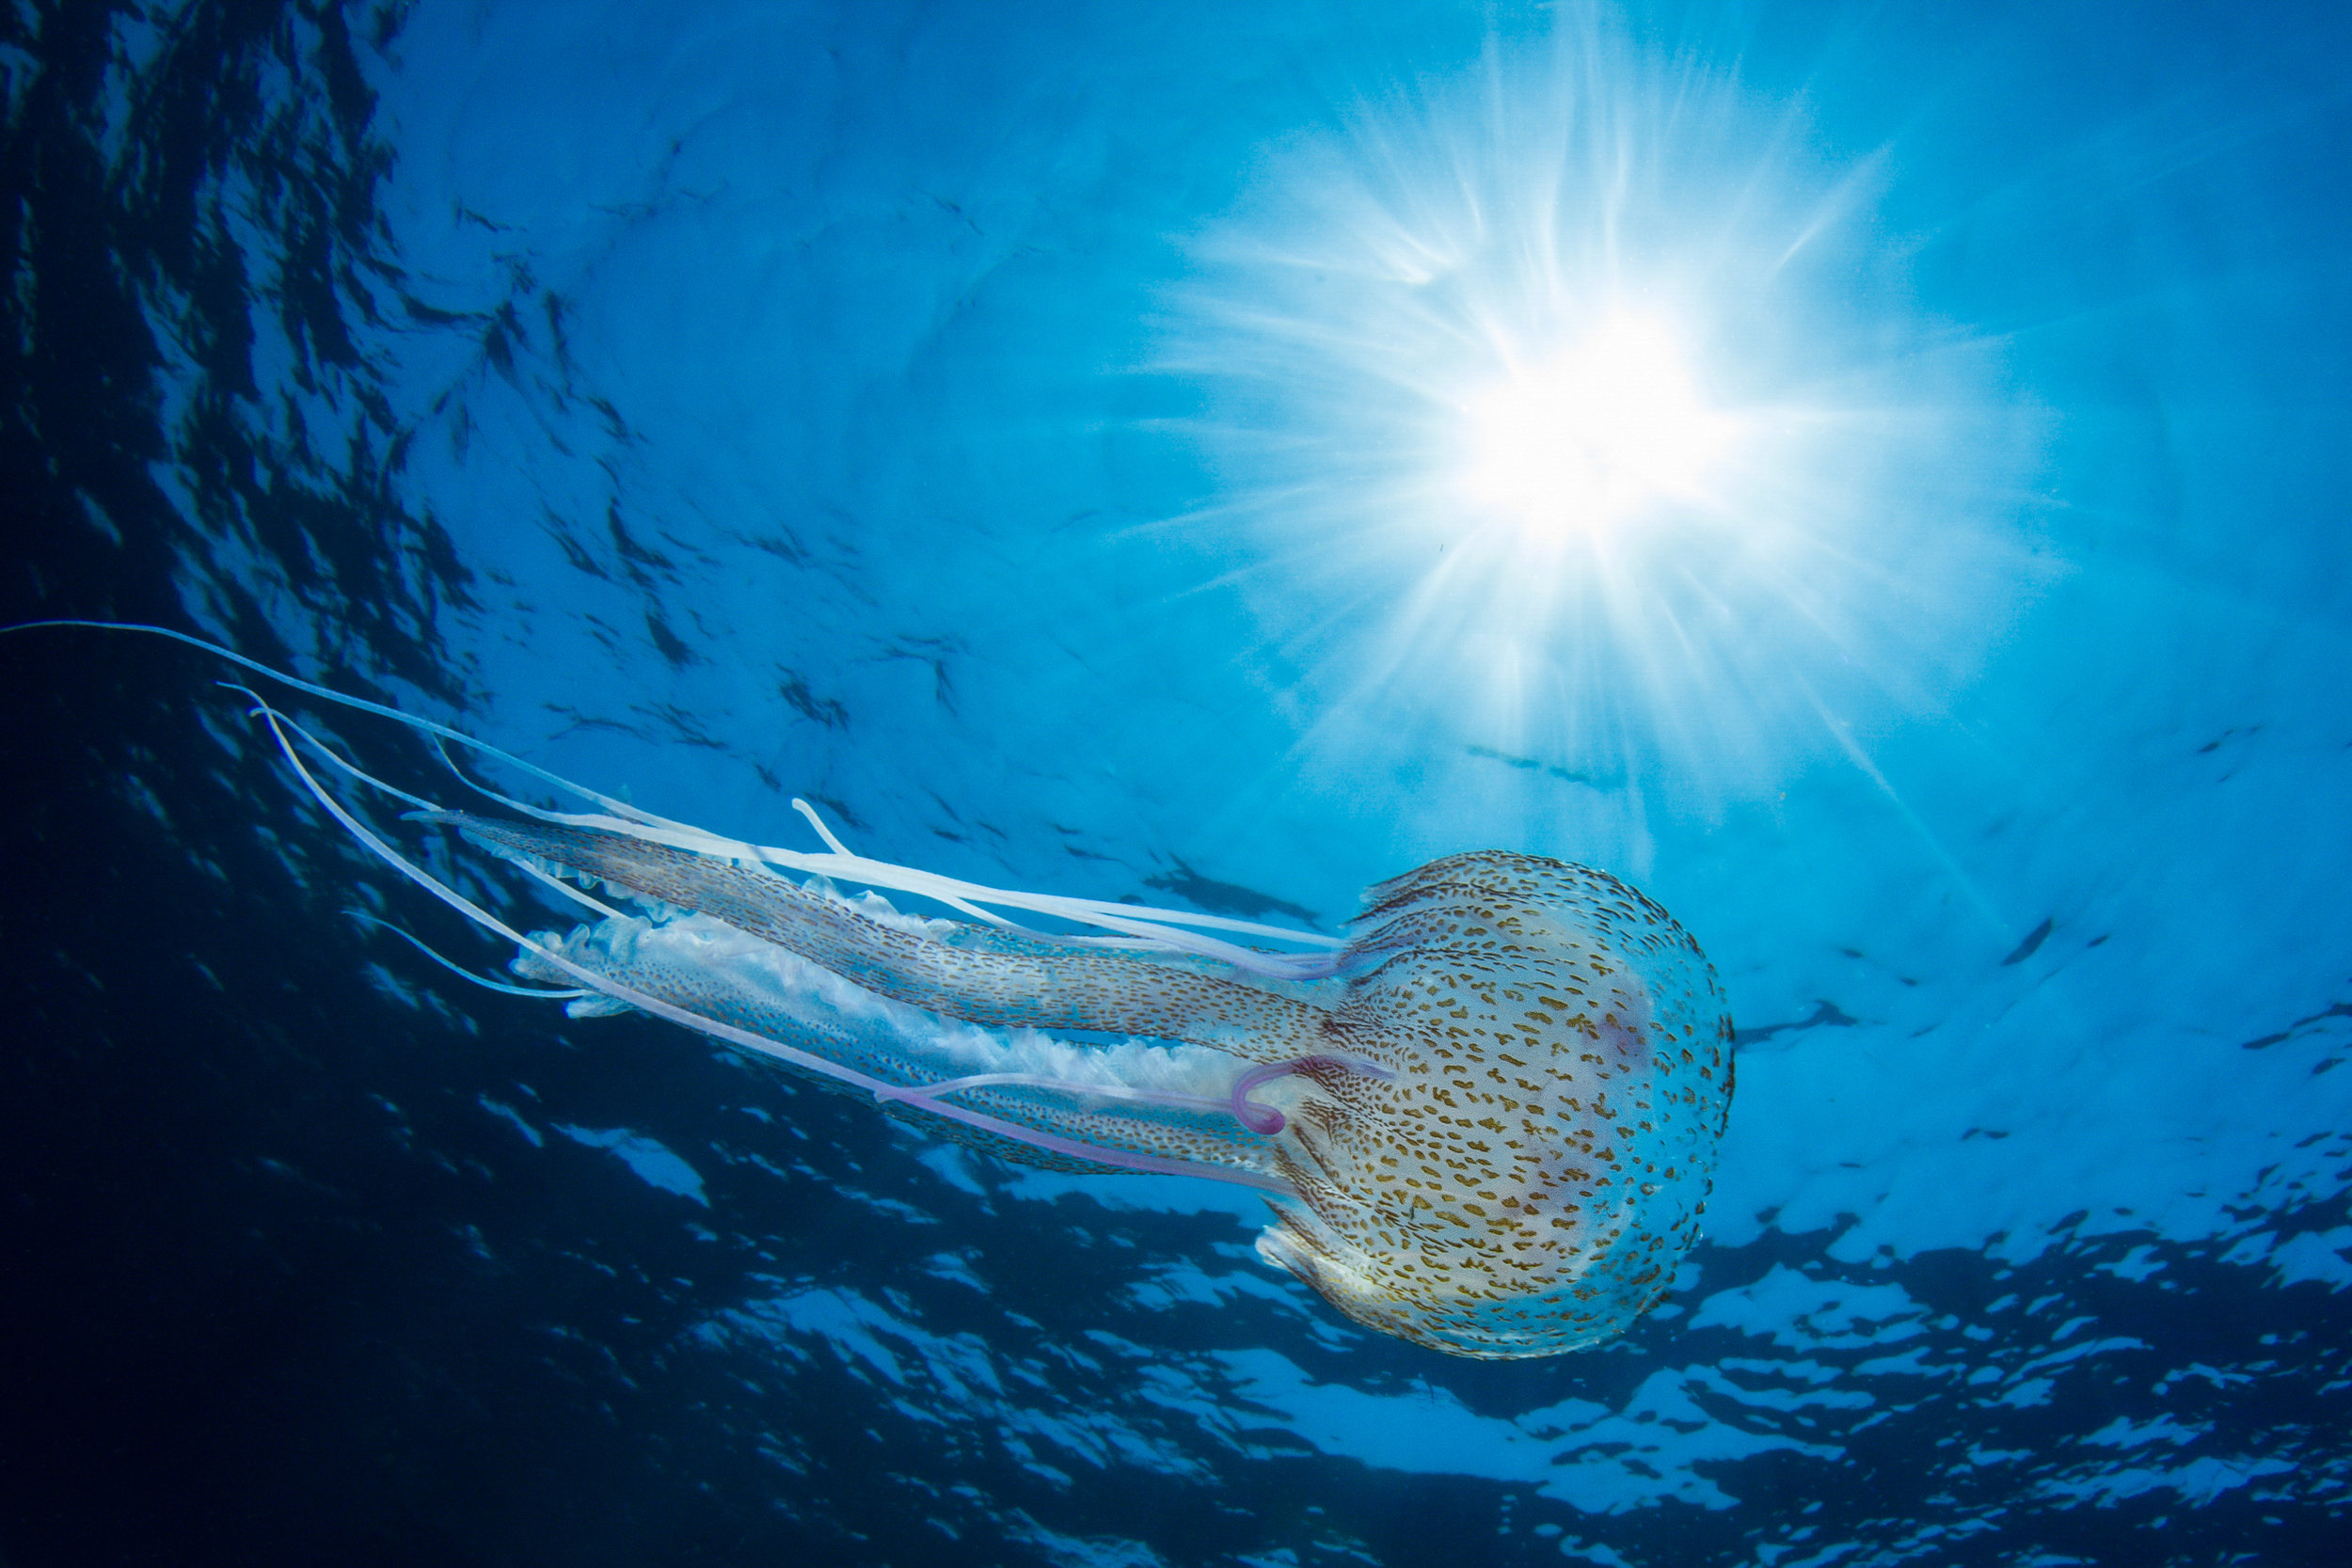 jellie credit: fabrice dudenhofer / coral reef image bank